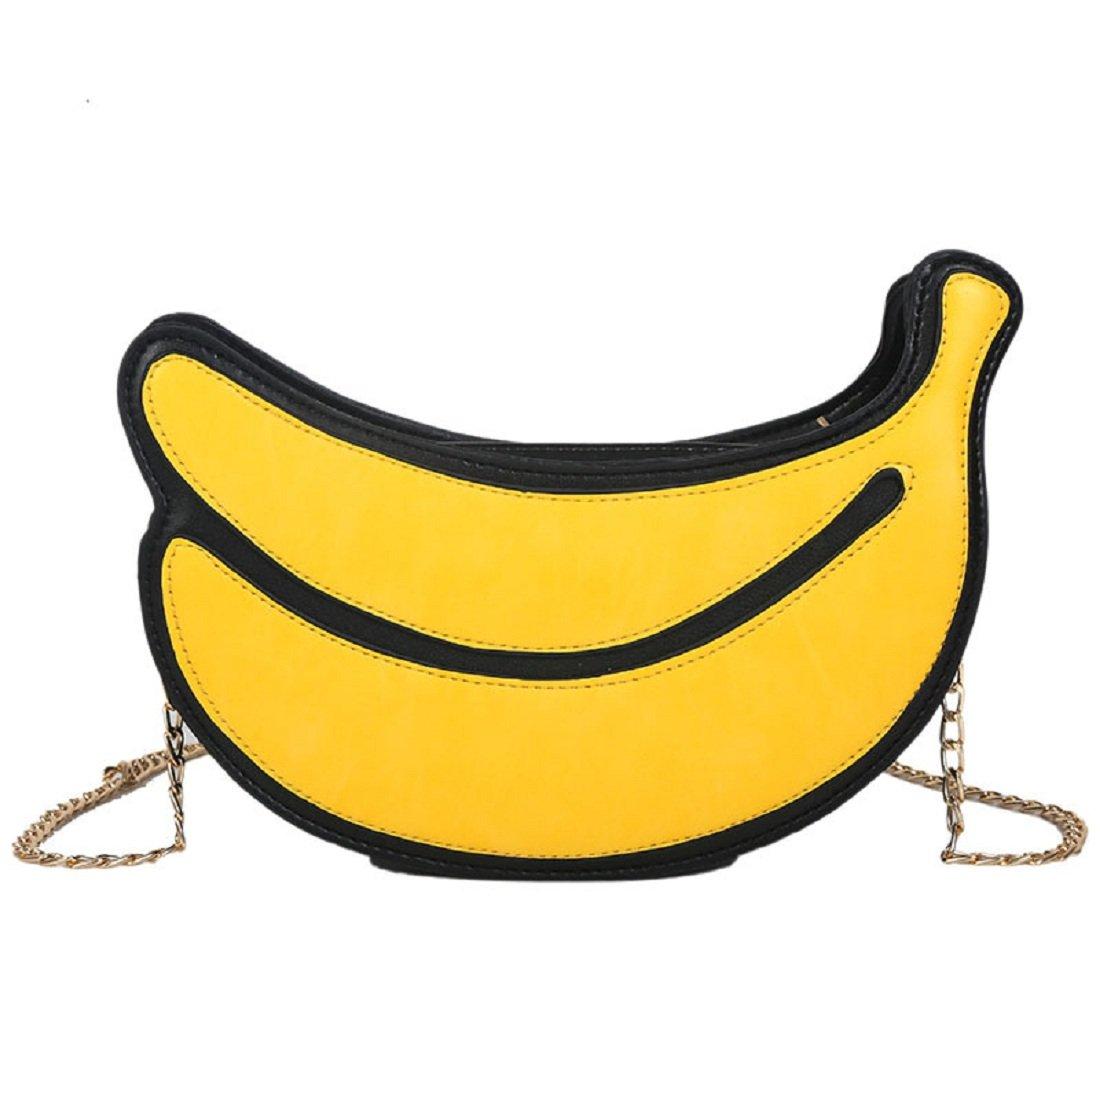 f9969ce1e7c Latest Novelty Cute Lemon Watermelon Pineapple Strawberry Shape Shoulder  Mini Bag for Women